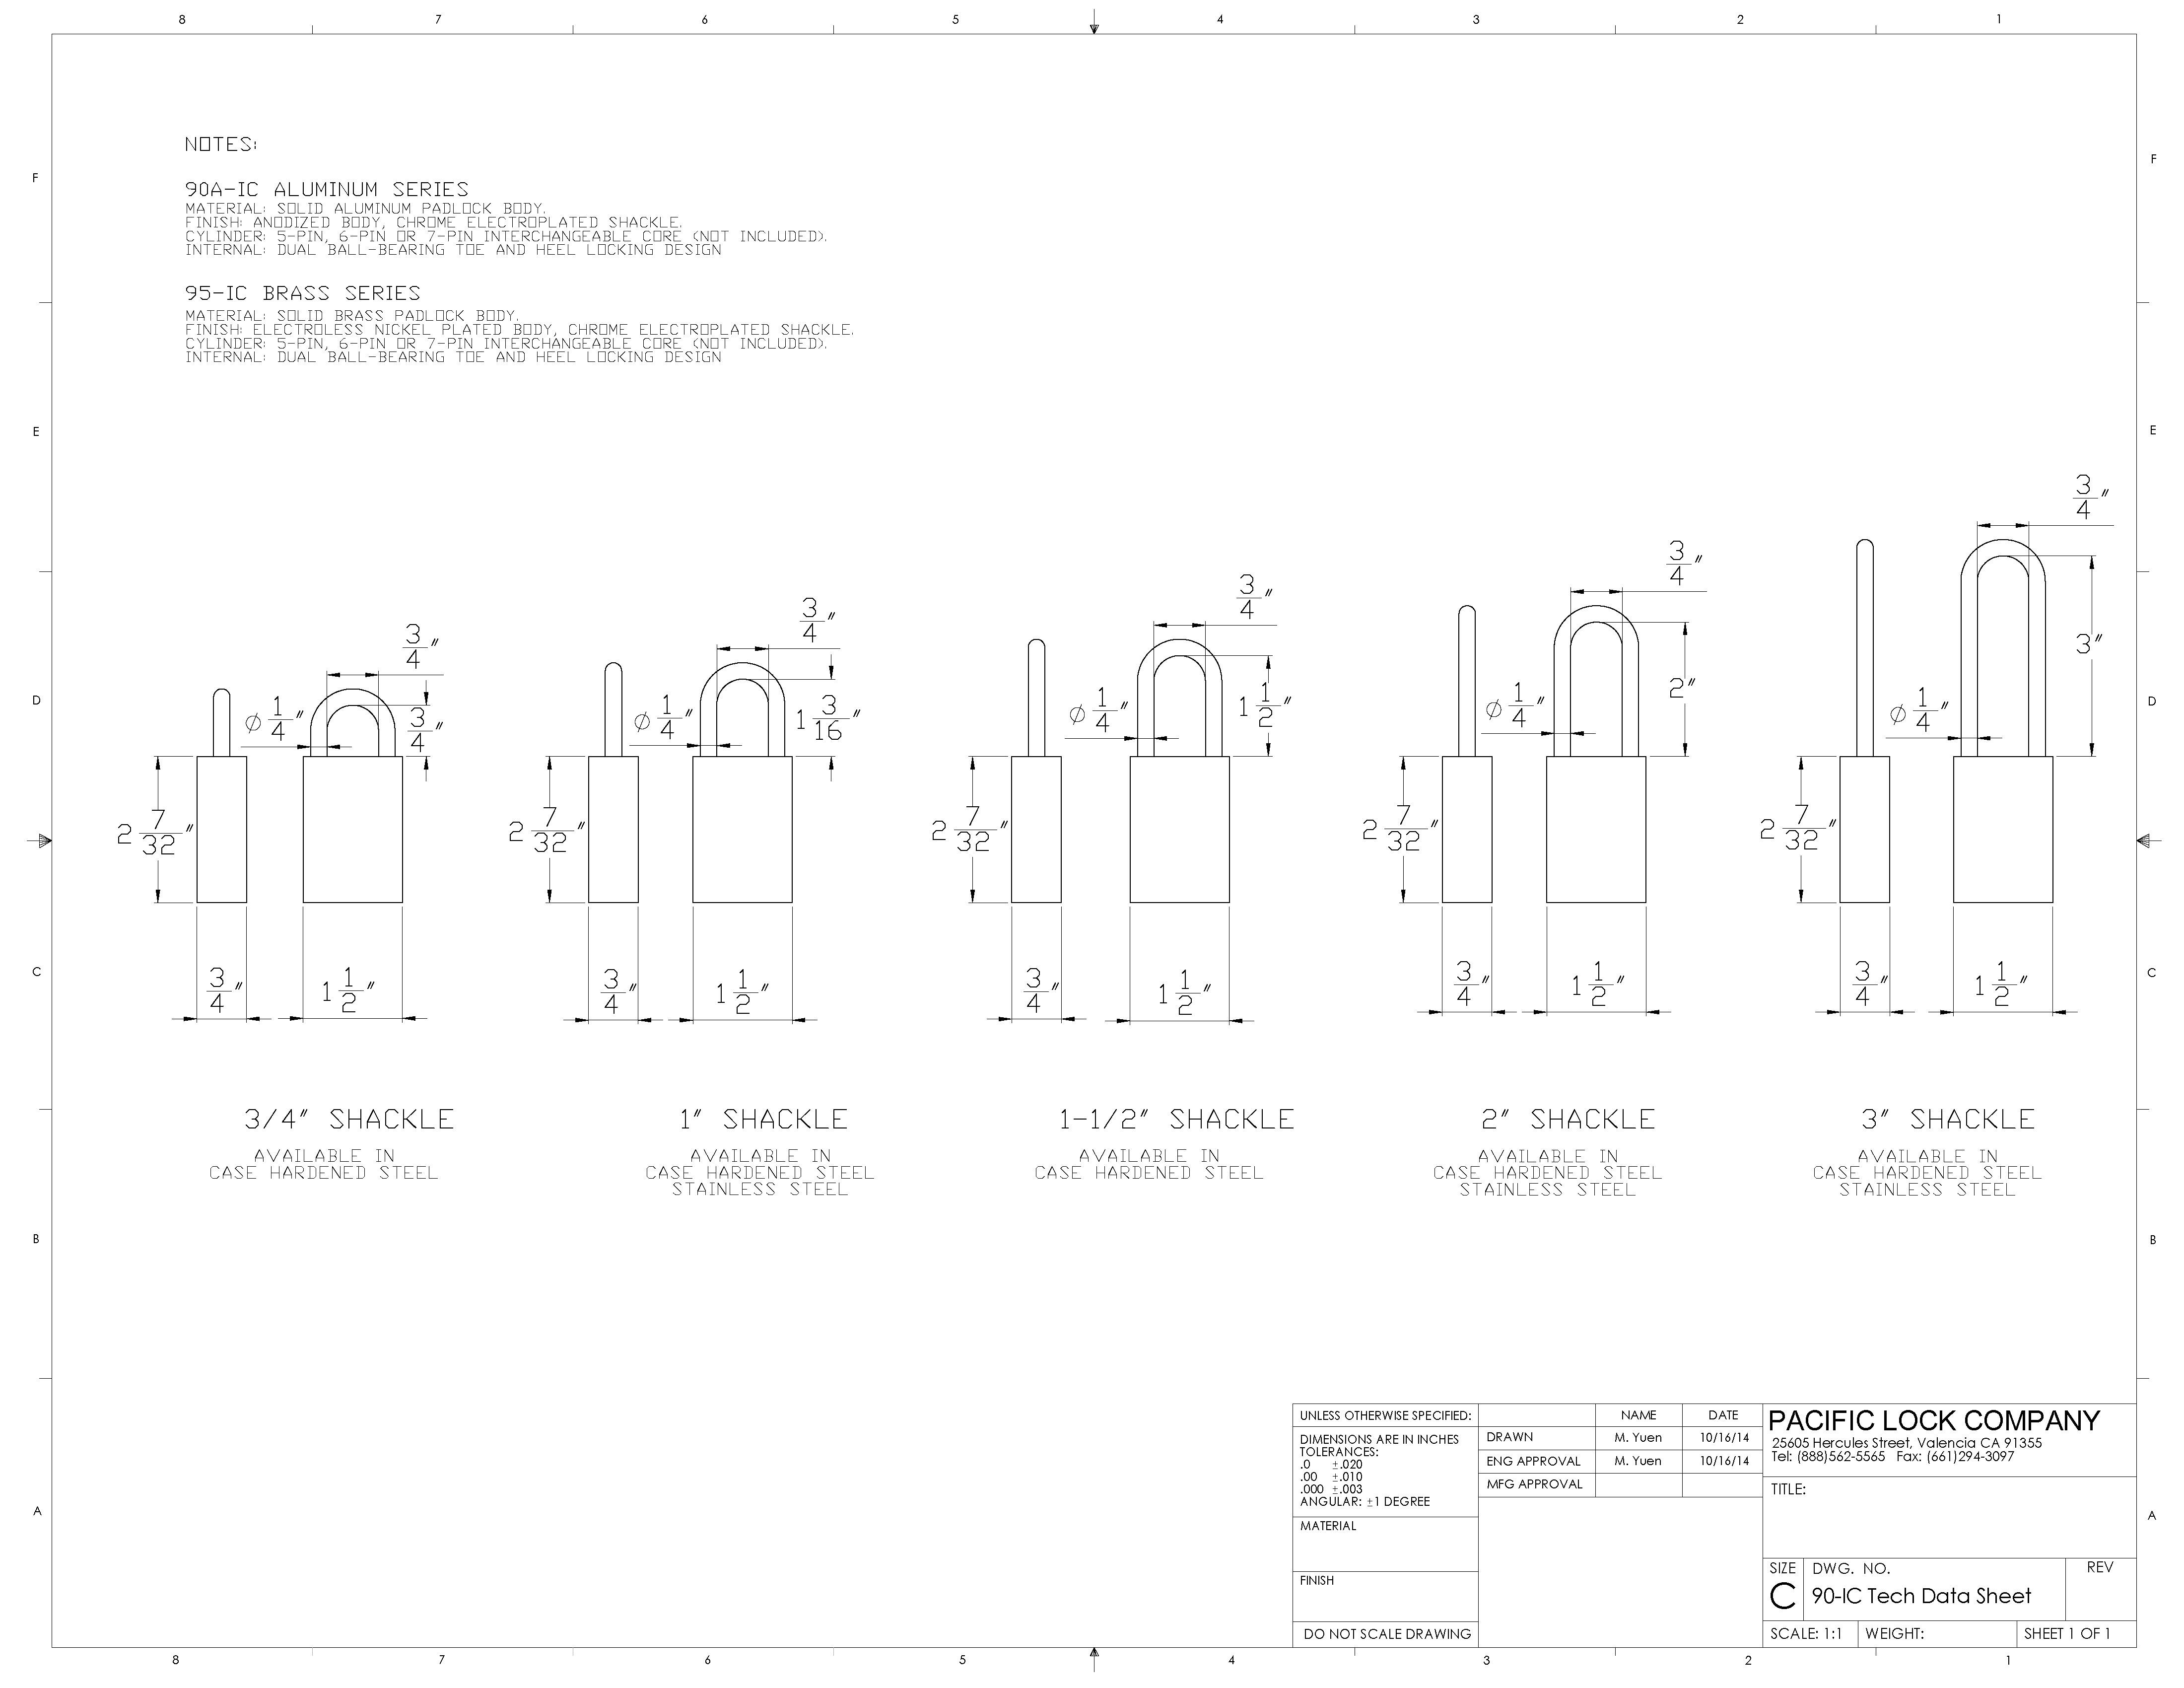 PACLOCK 90-IC Series Data Sheet